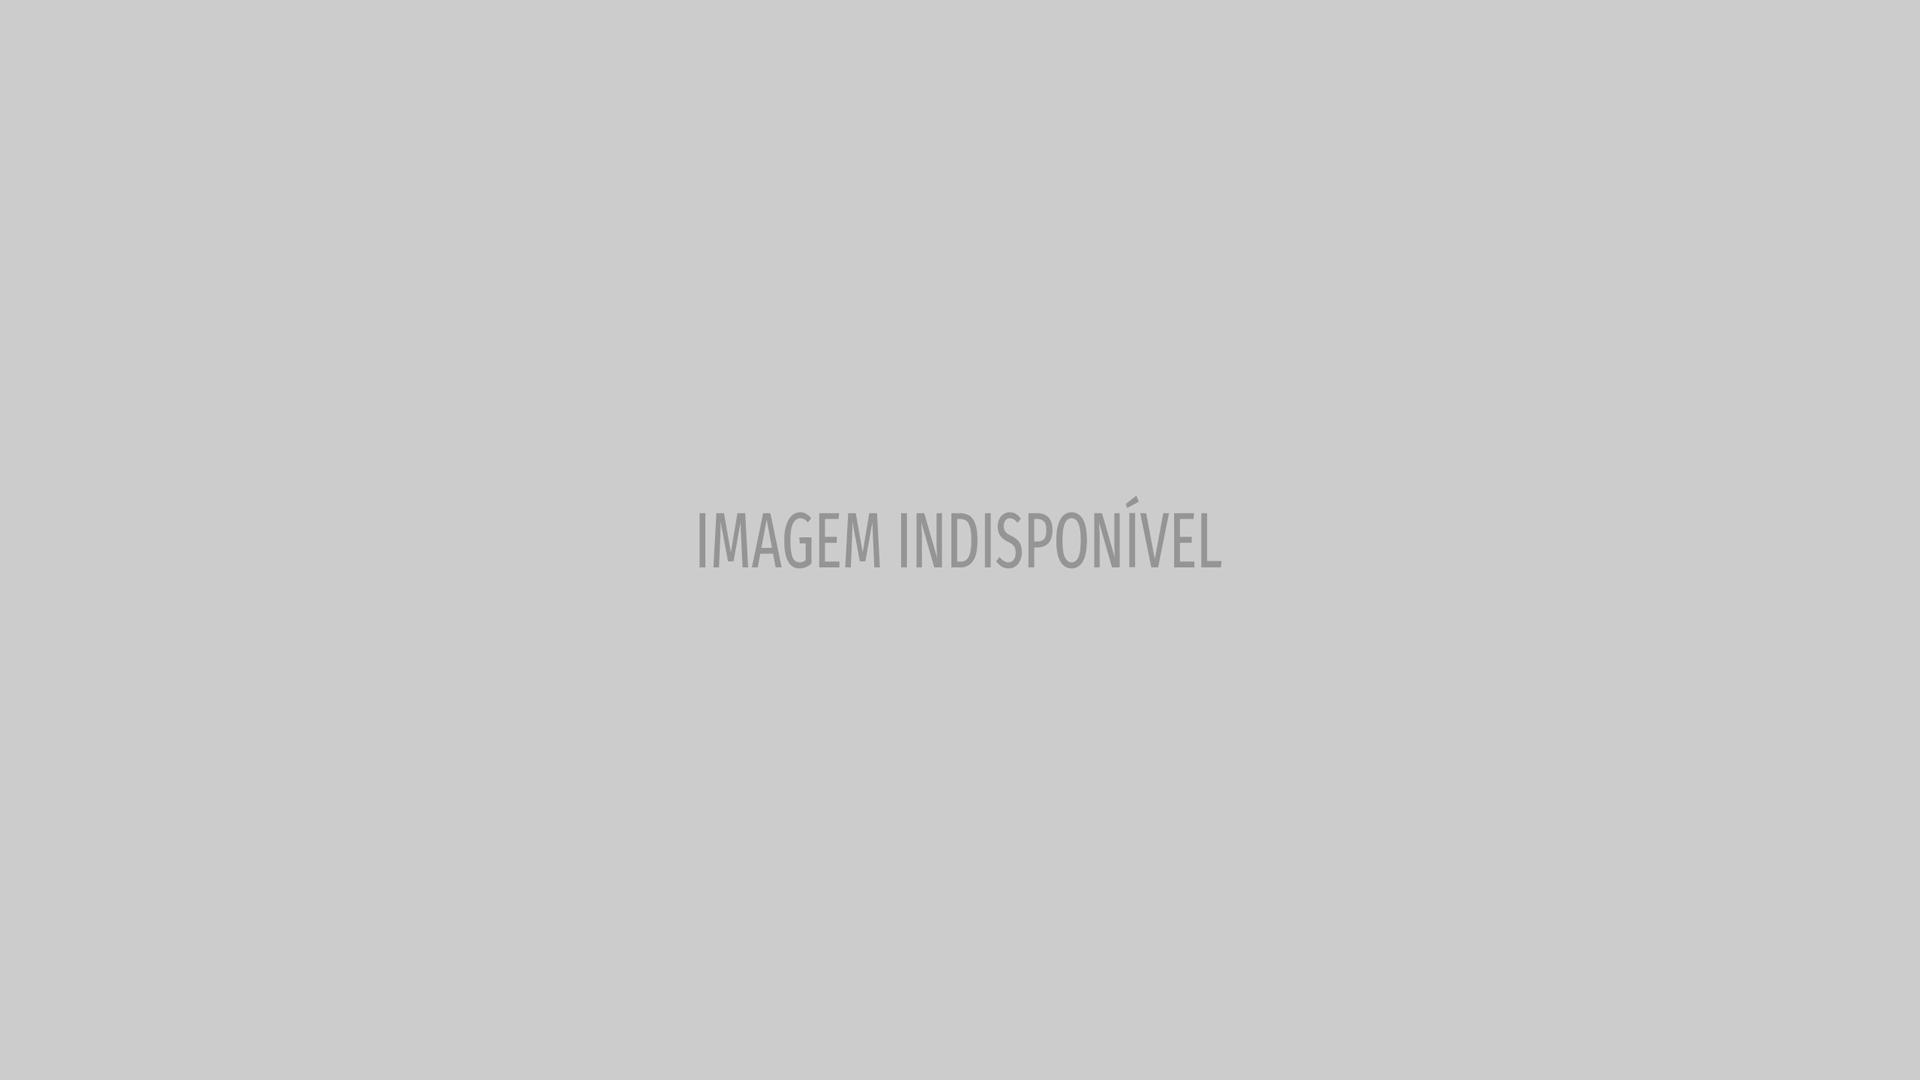 Gracyanne Barbosa posa de topless e barriga sarada impressiona